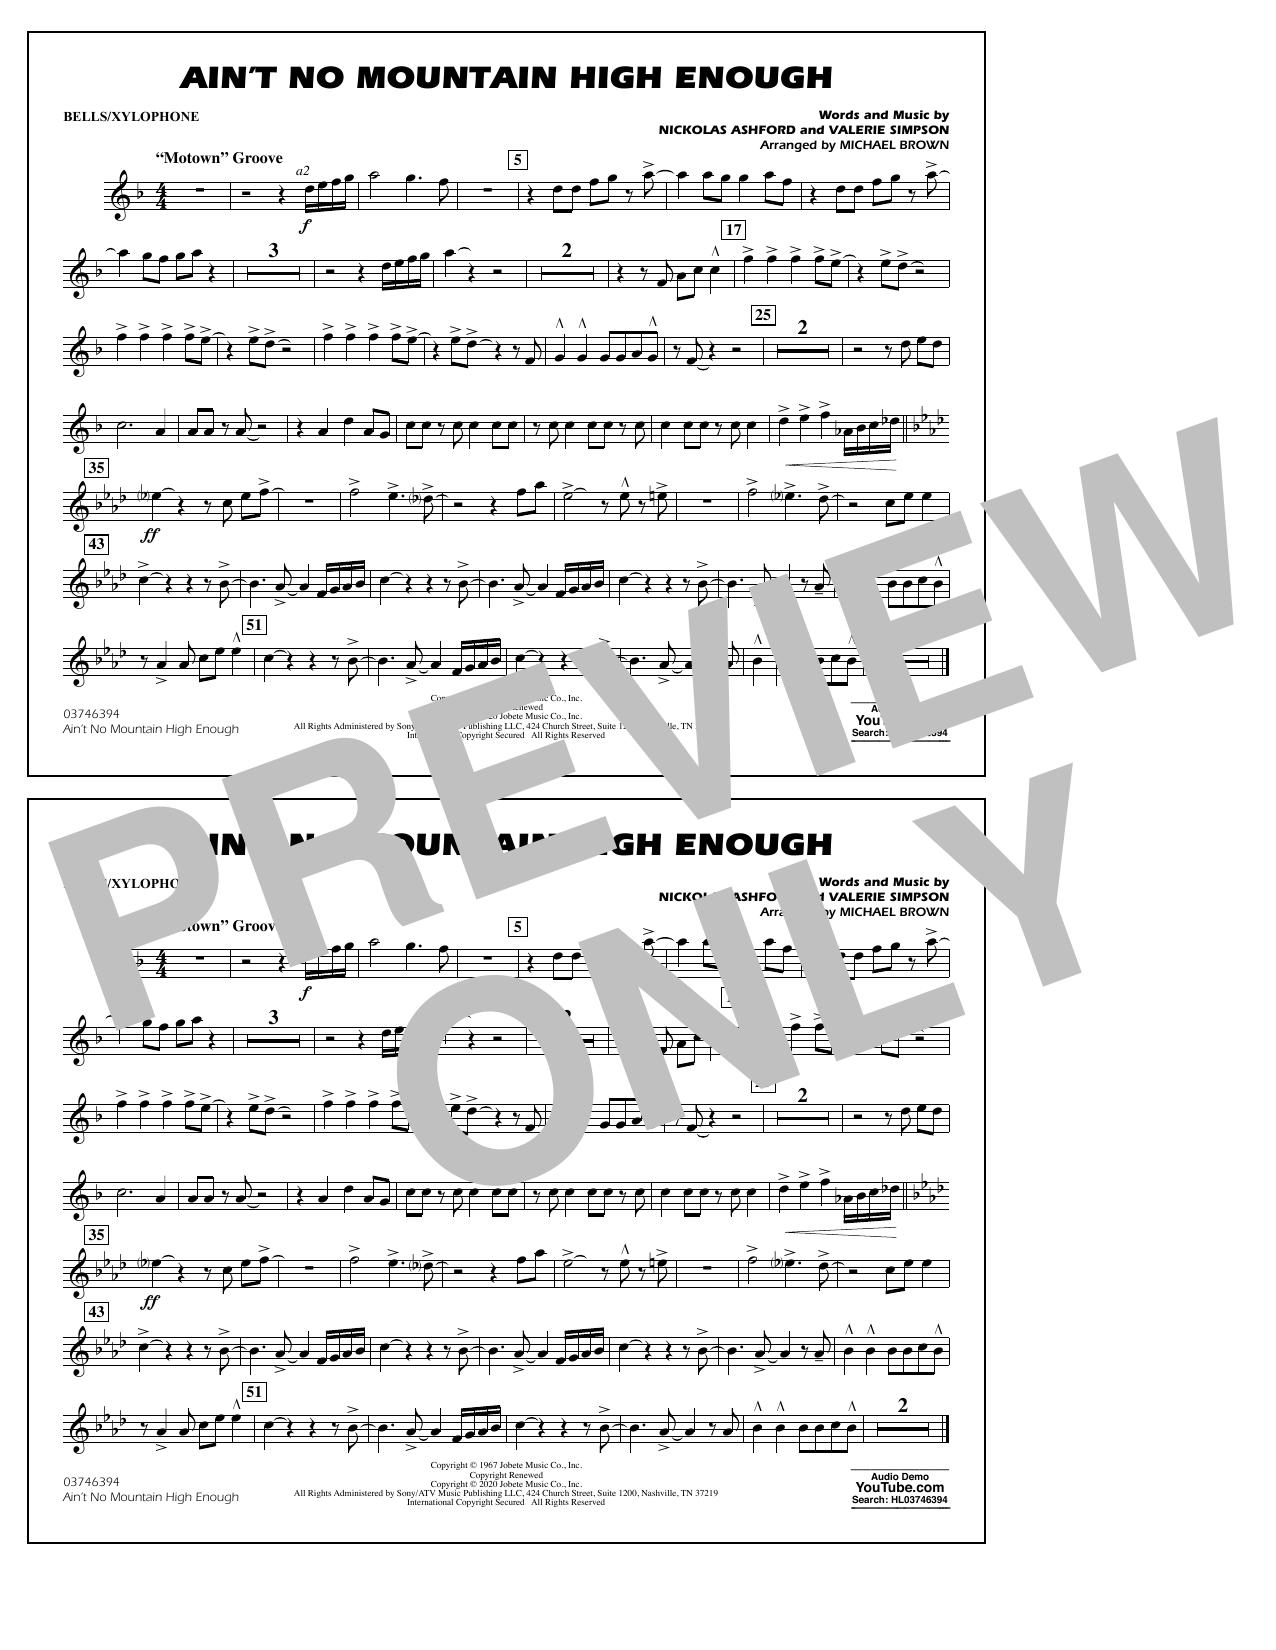 Ain't No Mountain High Enough (arr. Michael Brown) - Bells/Xylophone Sheet Music